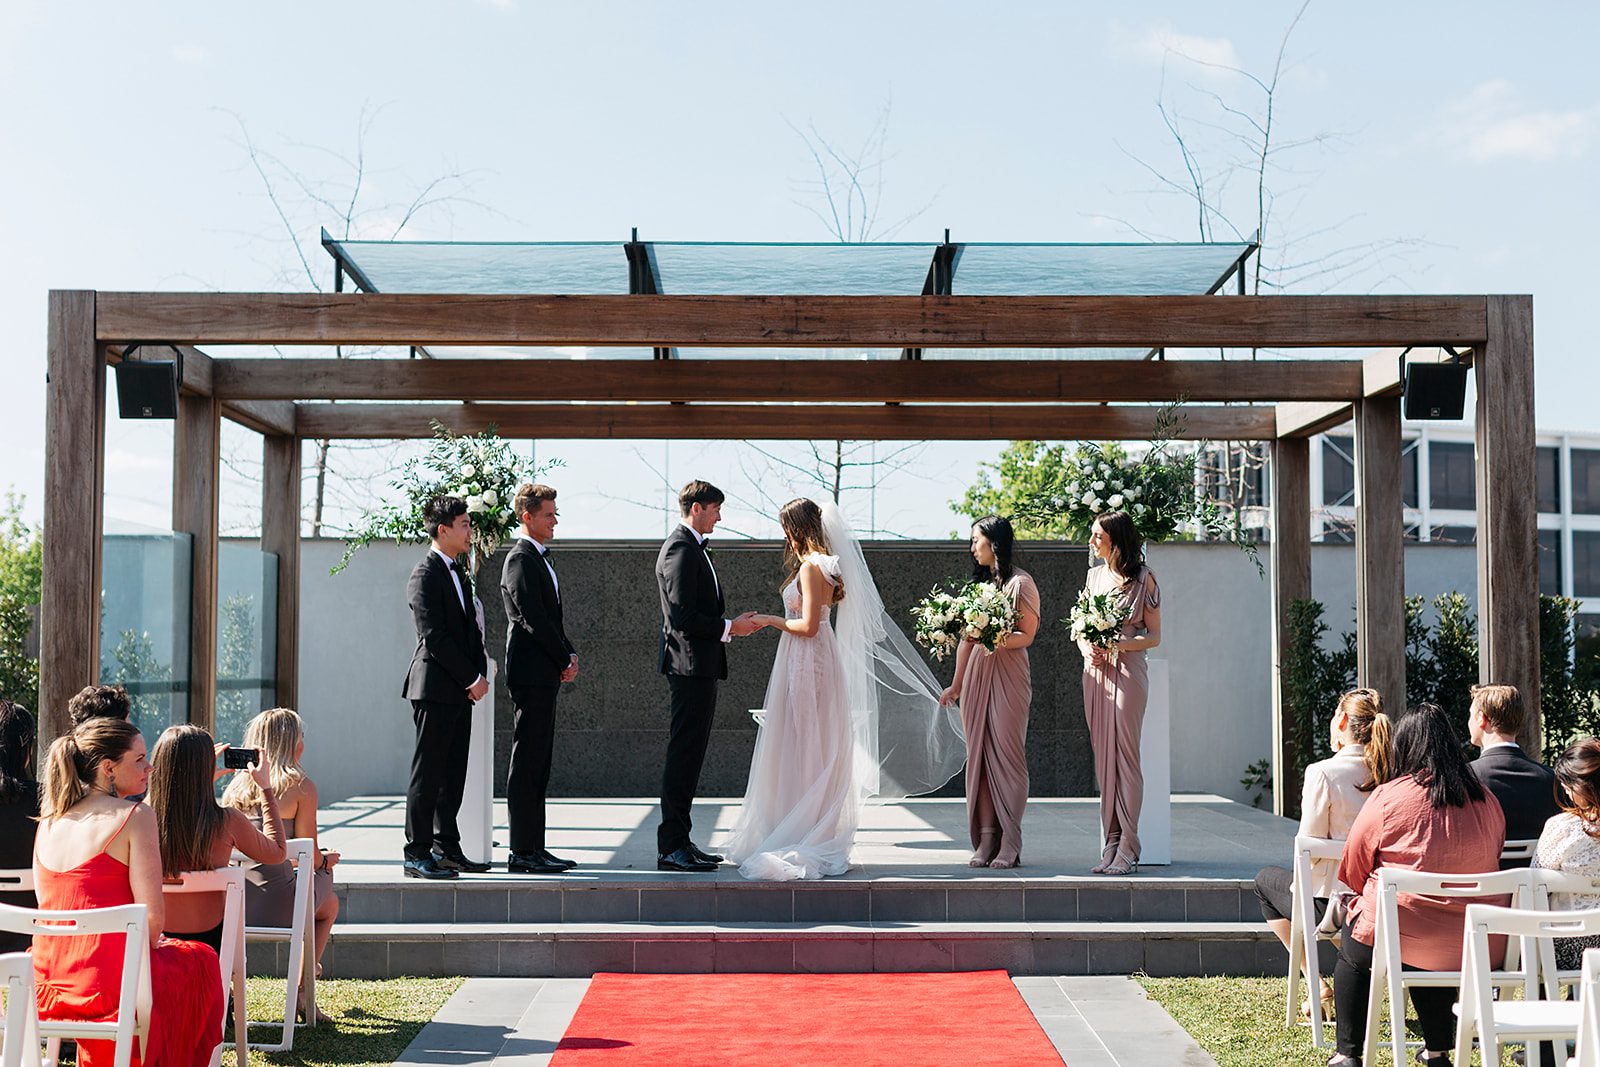 Hyatt Place Essendon Fields wedding styled shoot